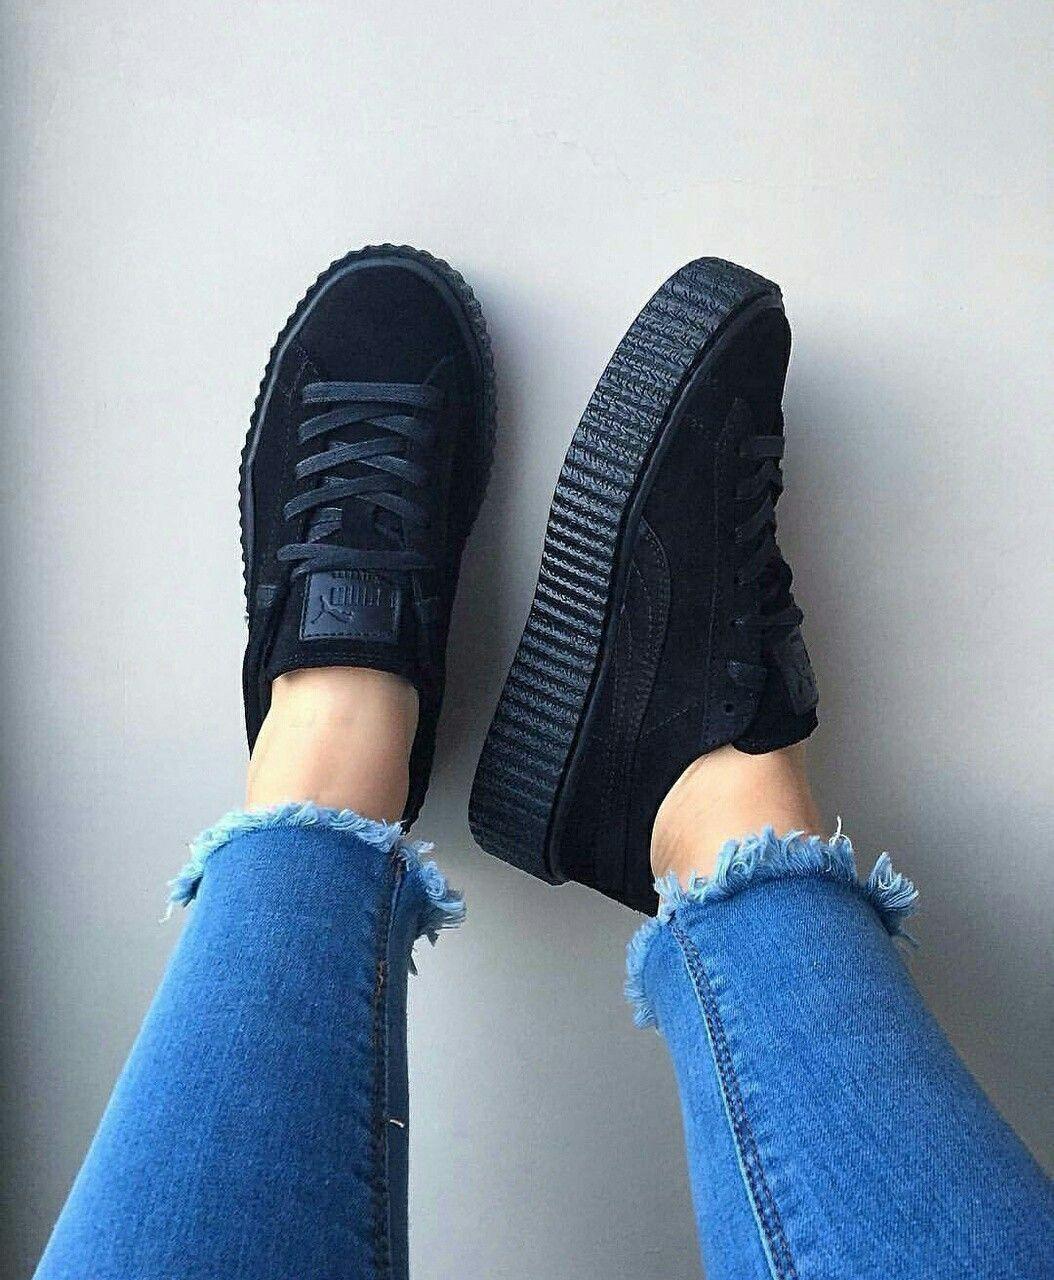 new style d02d3 e7a29 Puma Schwarz, Black Puma Creepers, Black Puma Shoes, Black Shoes Sneakers,  All